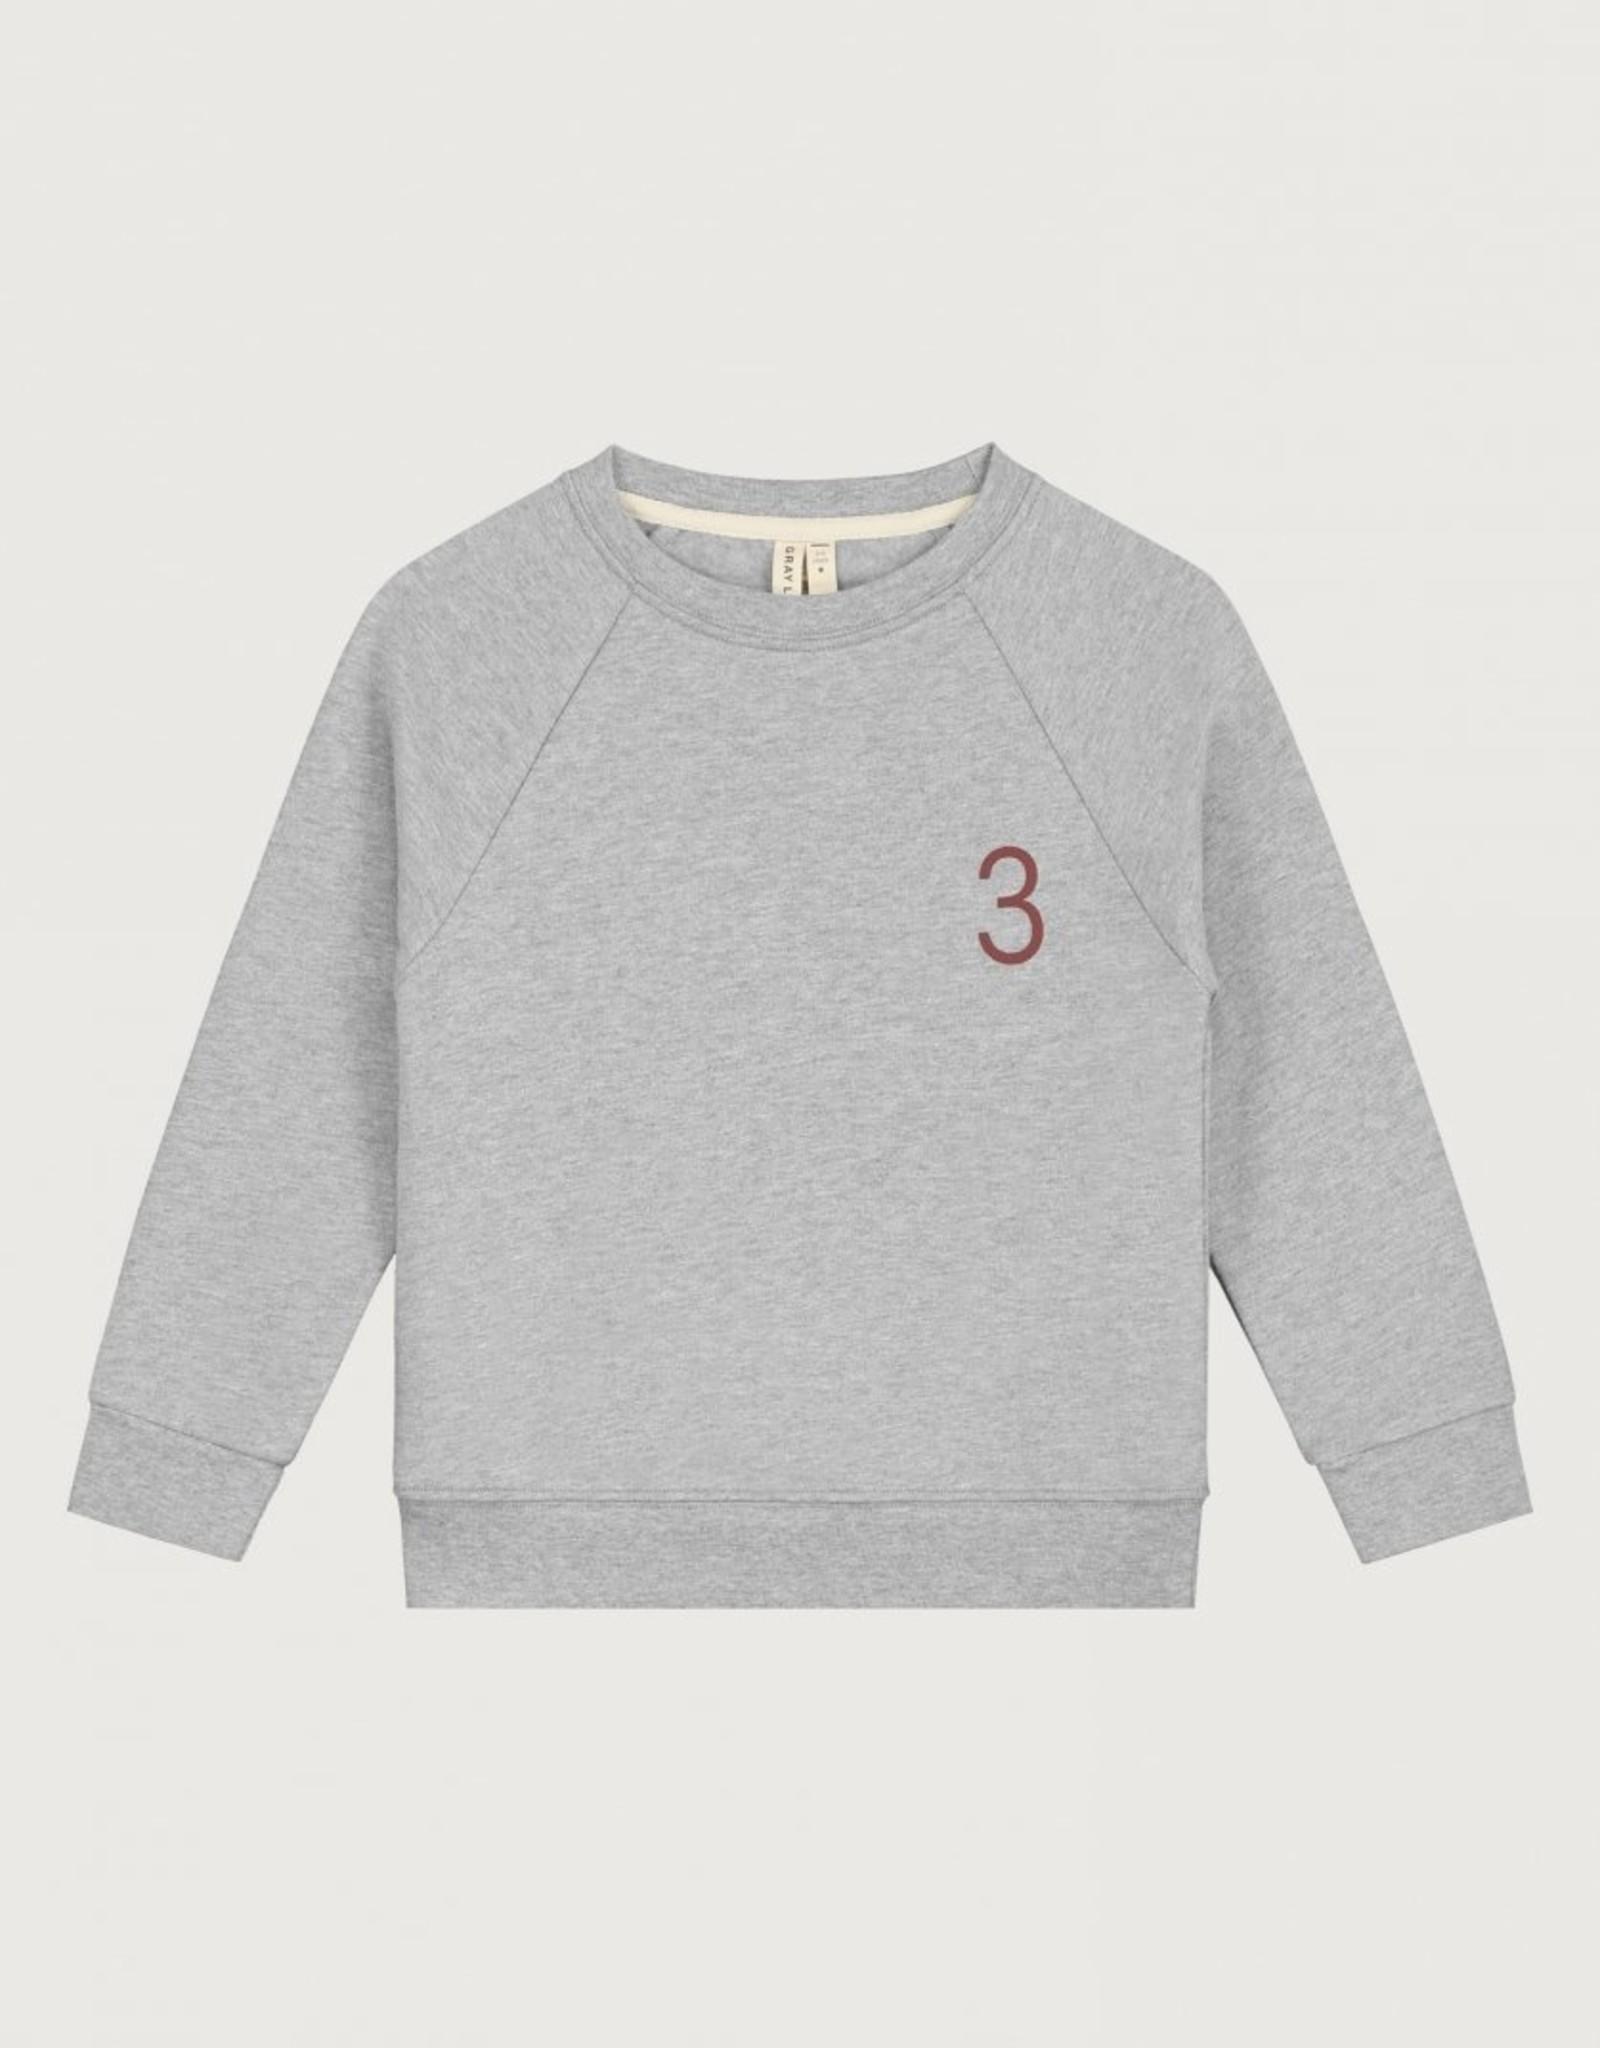 Gray Label Gray Label sweater 3 in grey melange